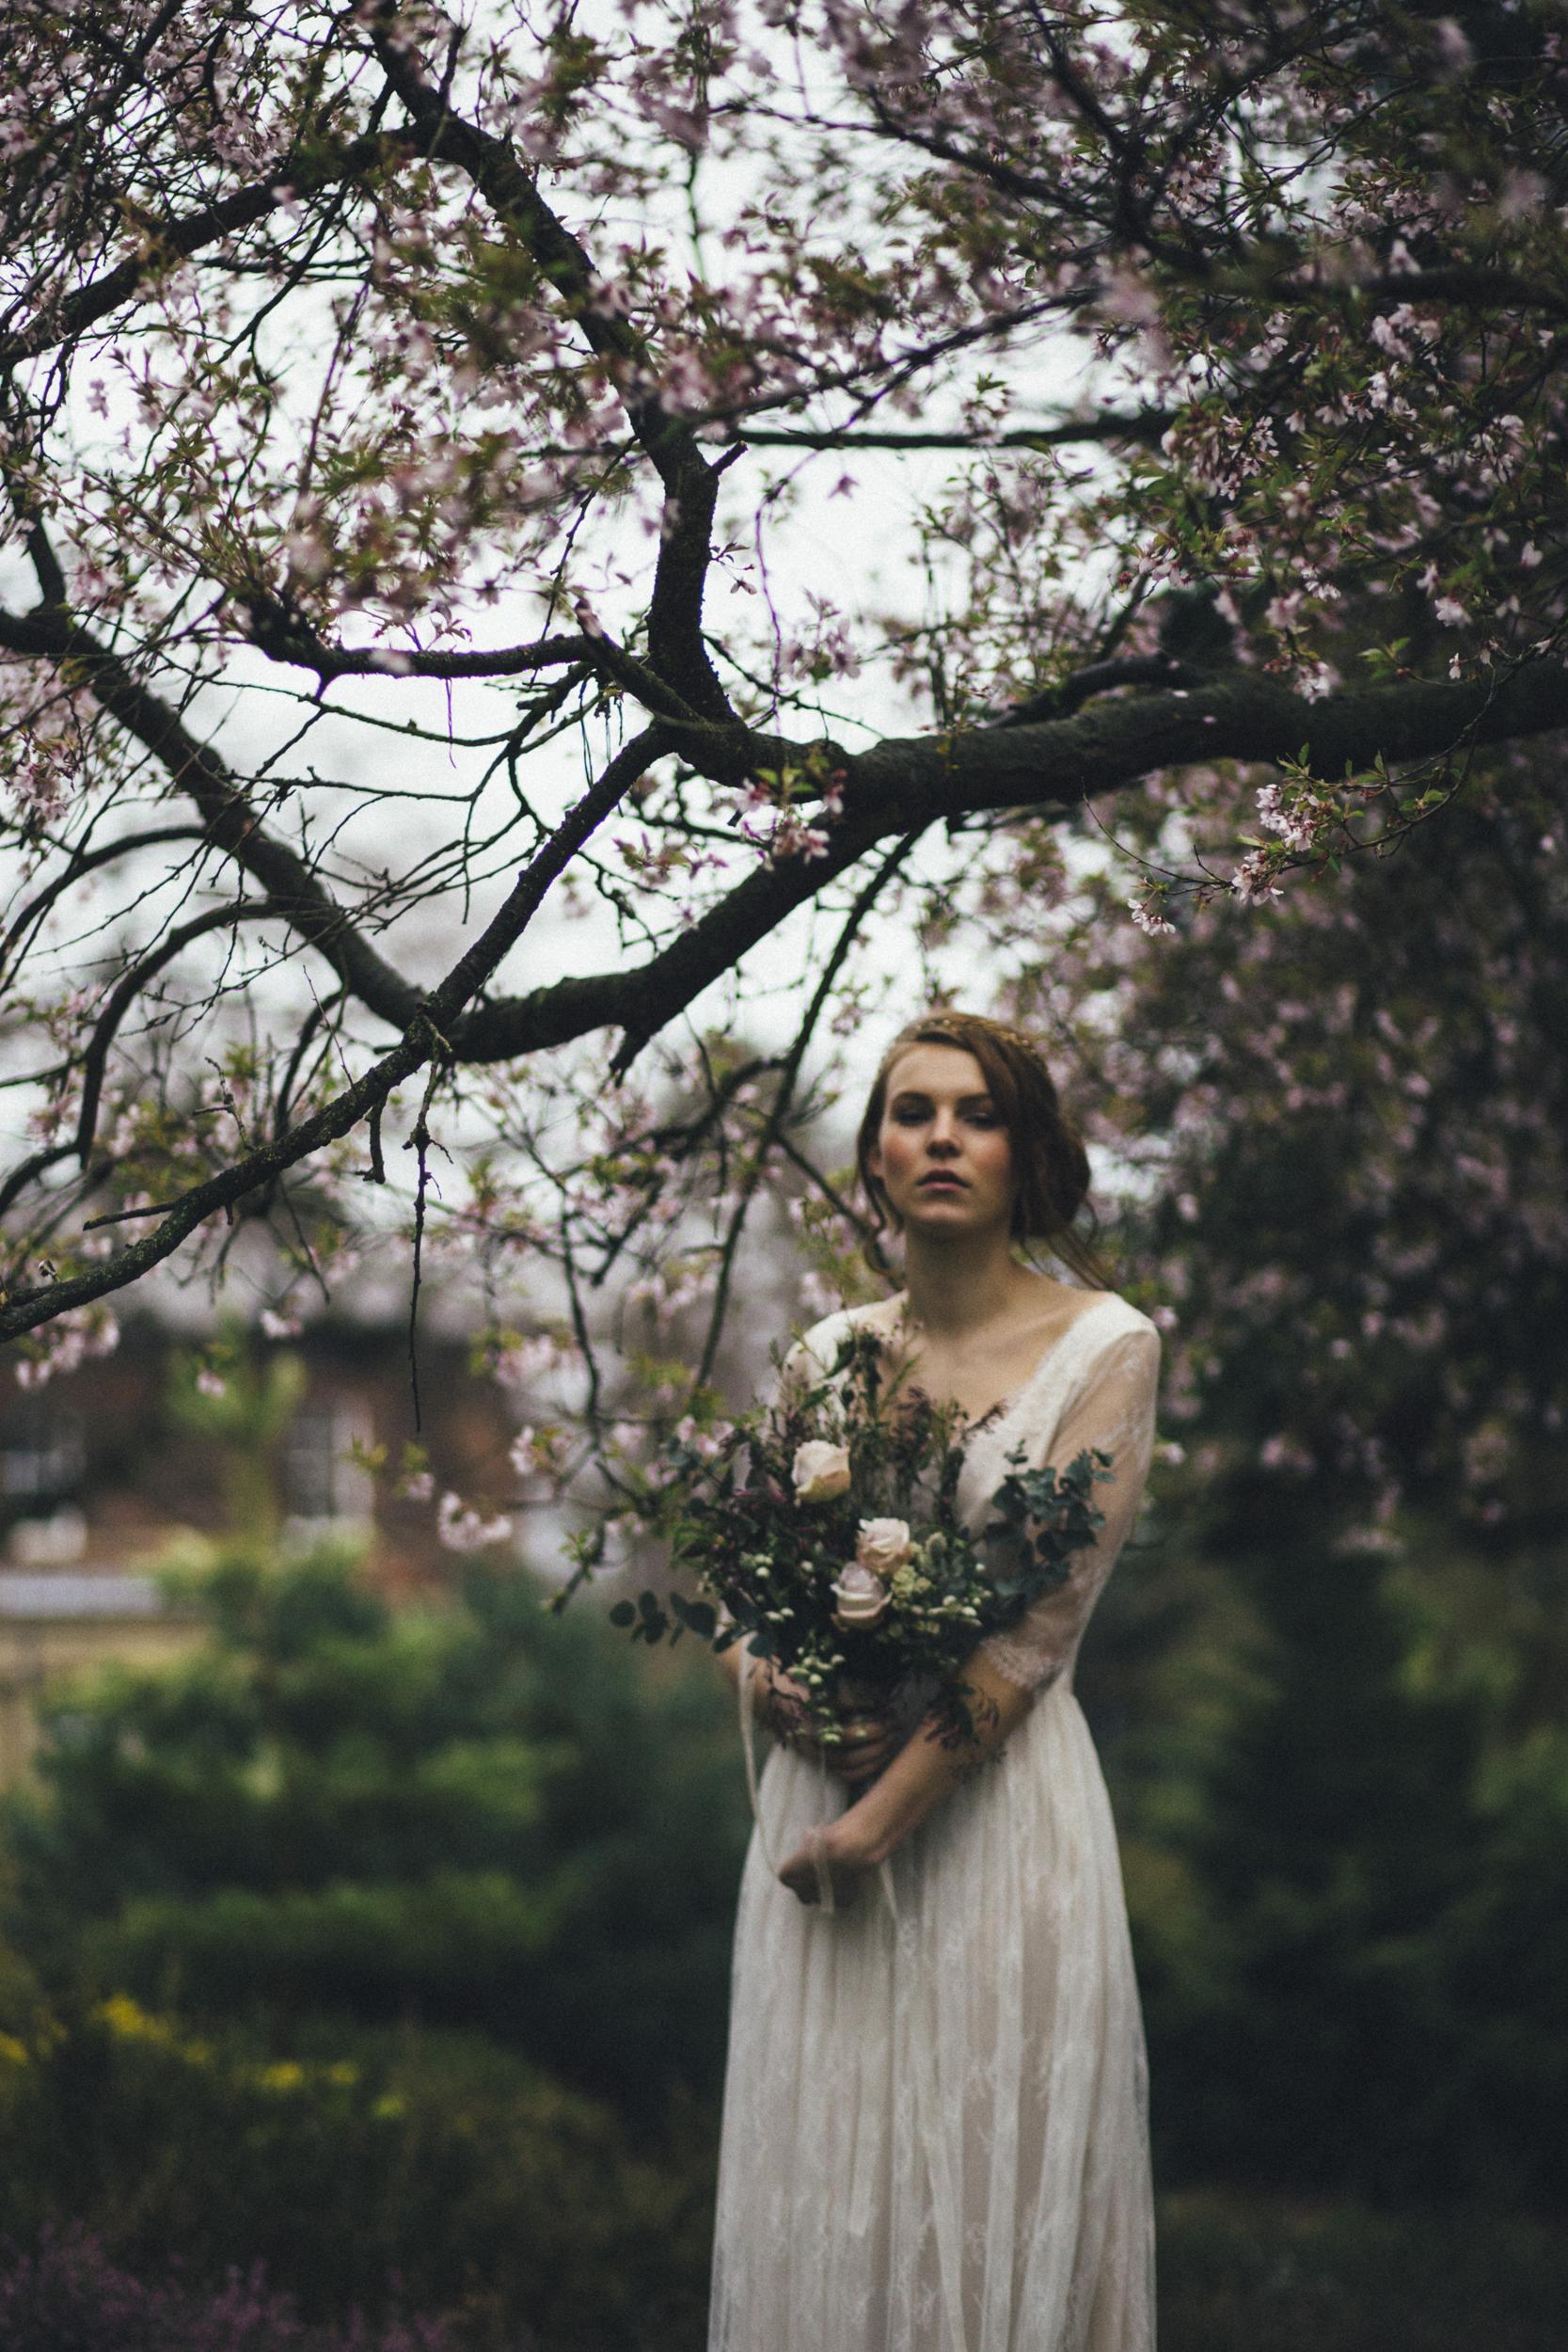 Spring-Bridal-Kate-Beaumont-Shelley-Richmond-Vintage-Wedding-Dress-2.jpg